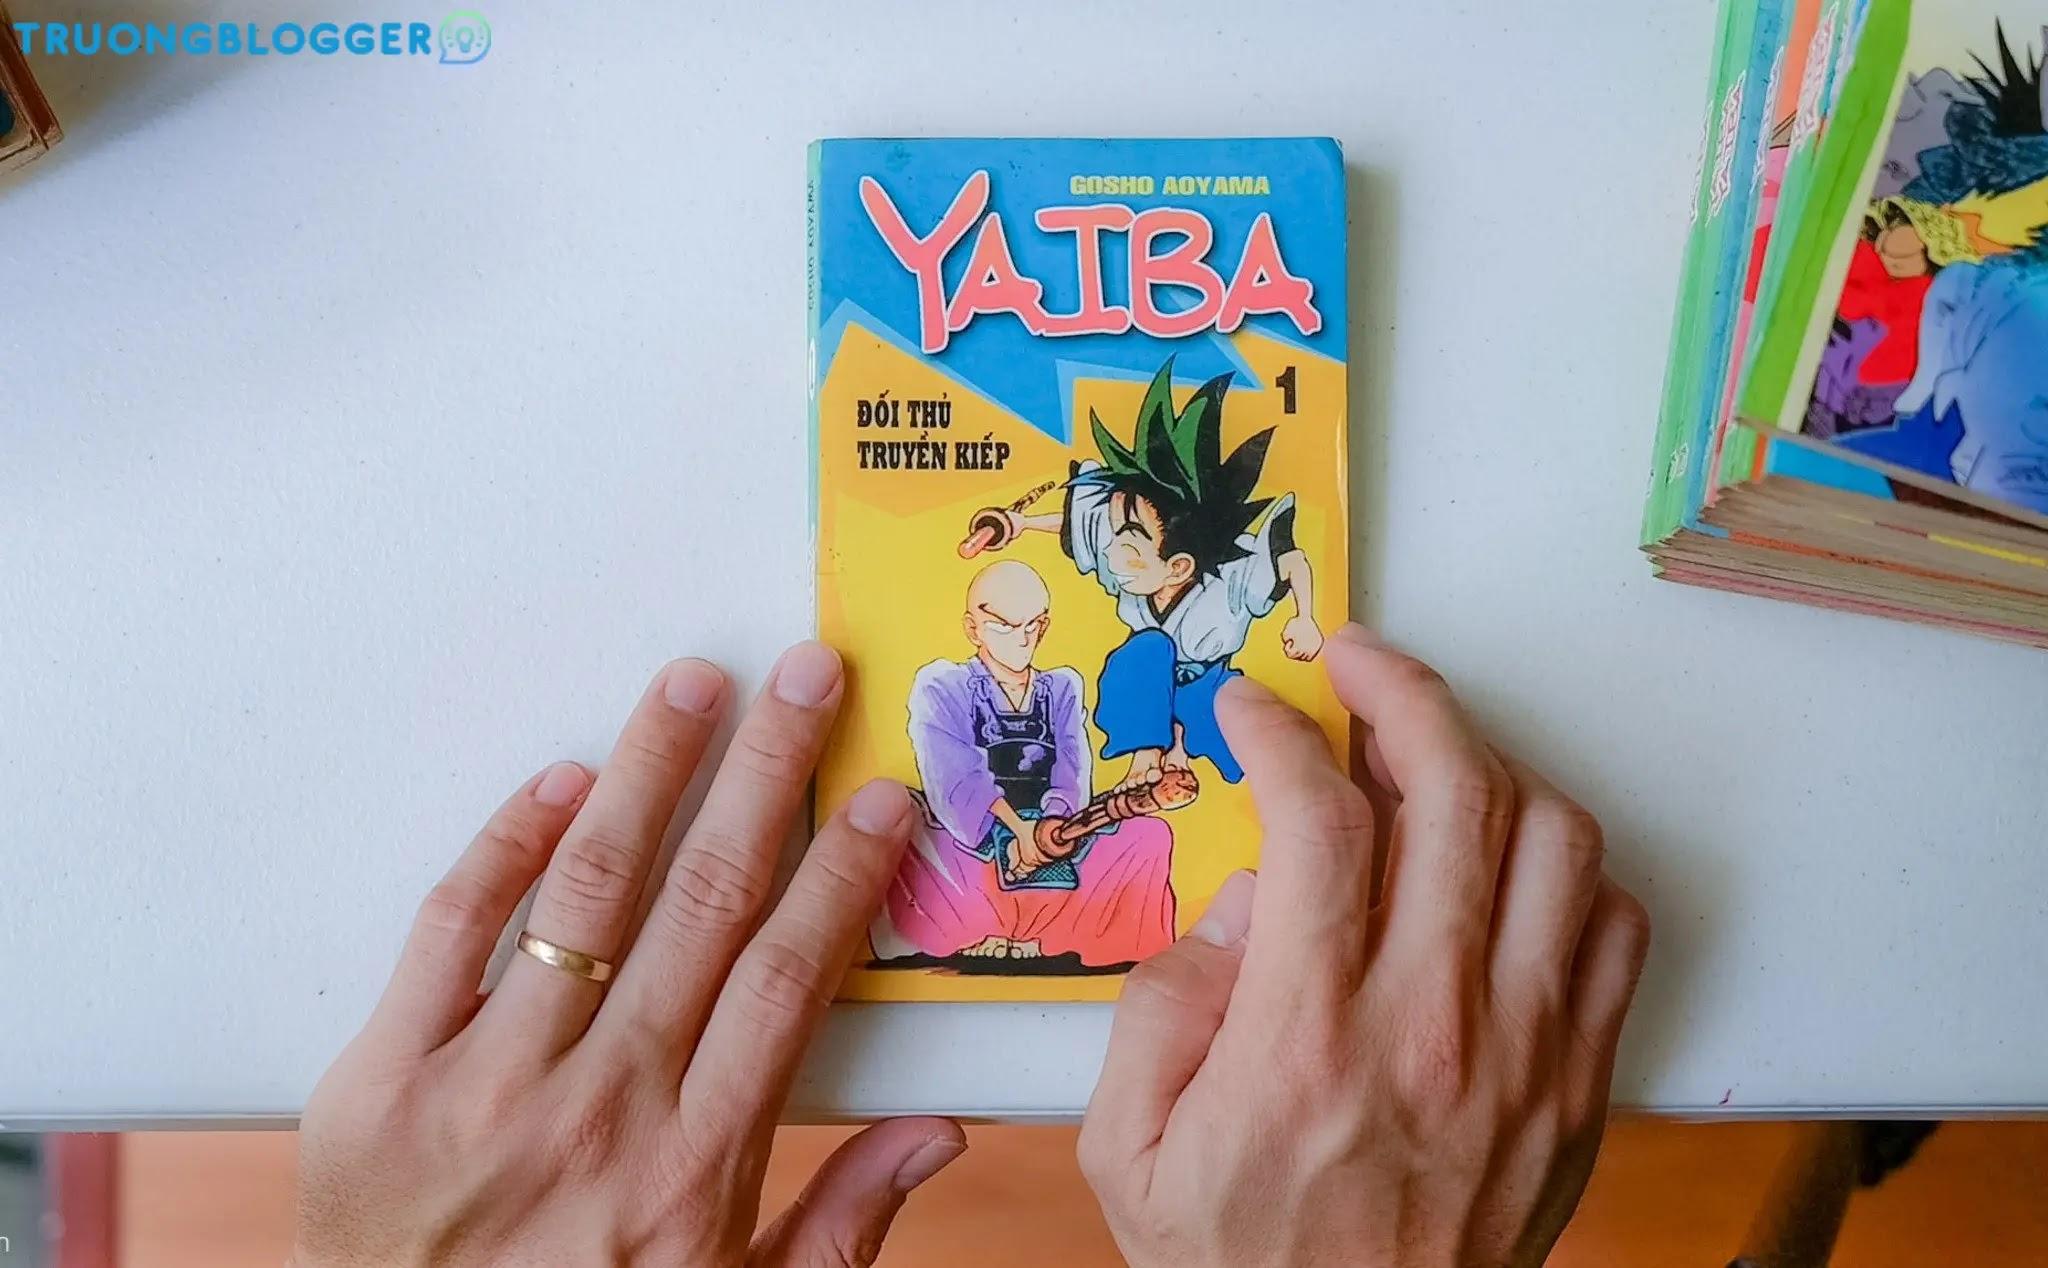 Chia sẻ trọn bộ truyện tranh Yaiba File PDF